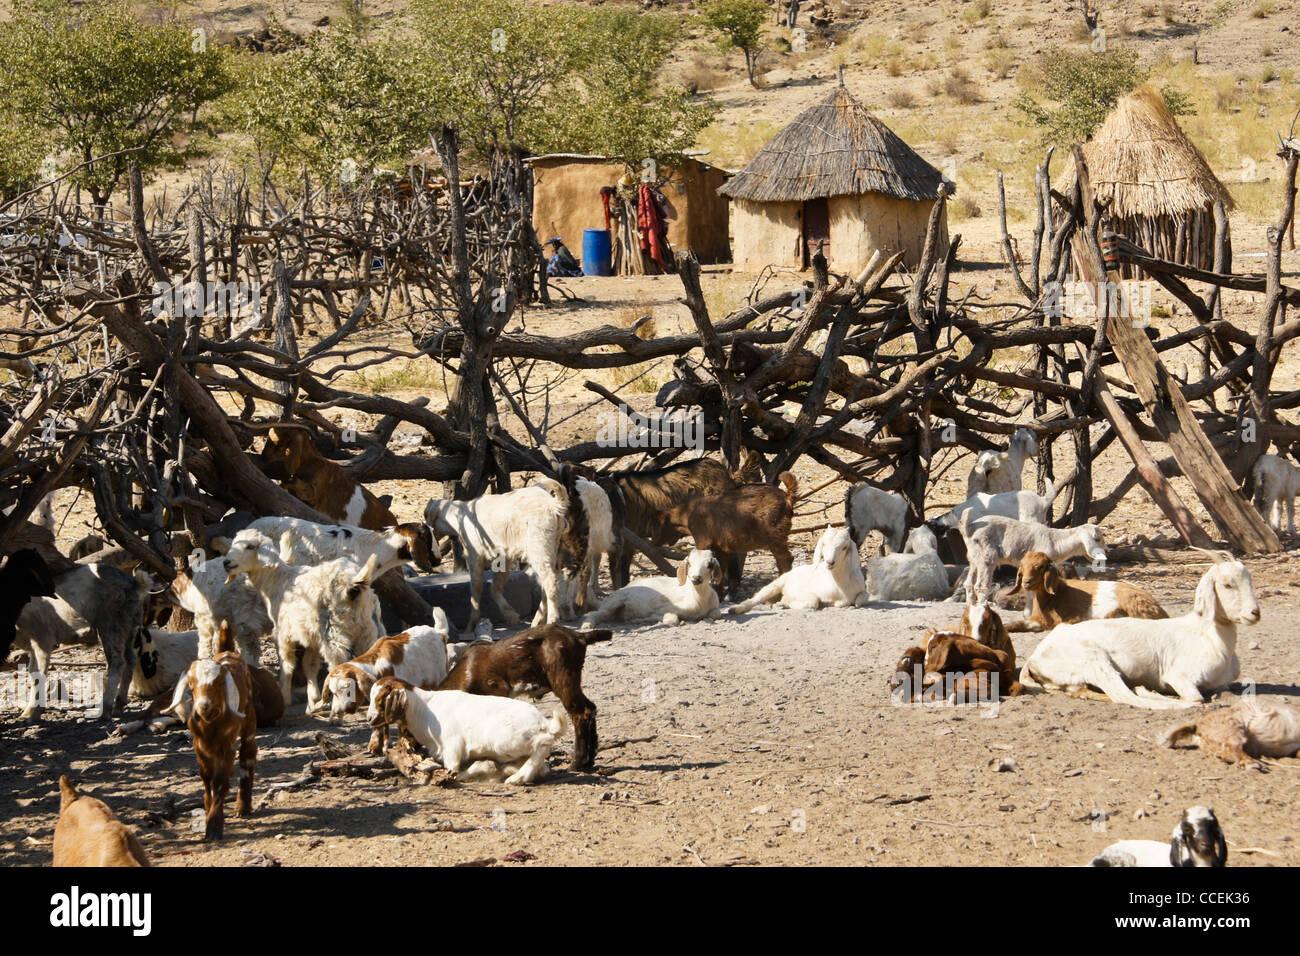 Goats in Himba village near Opuwo, Namibia - Stock Image